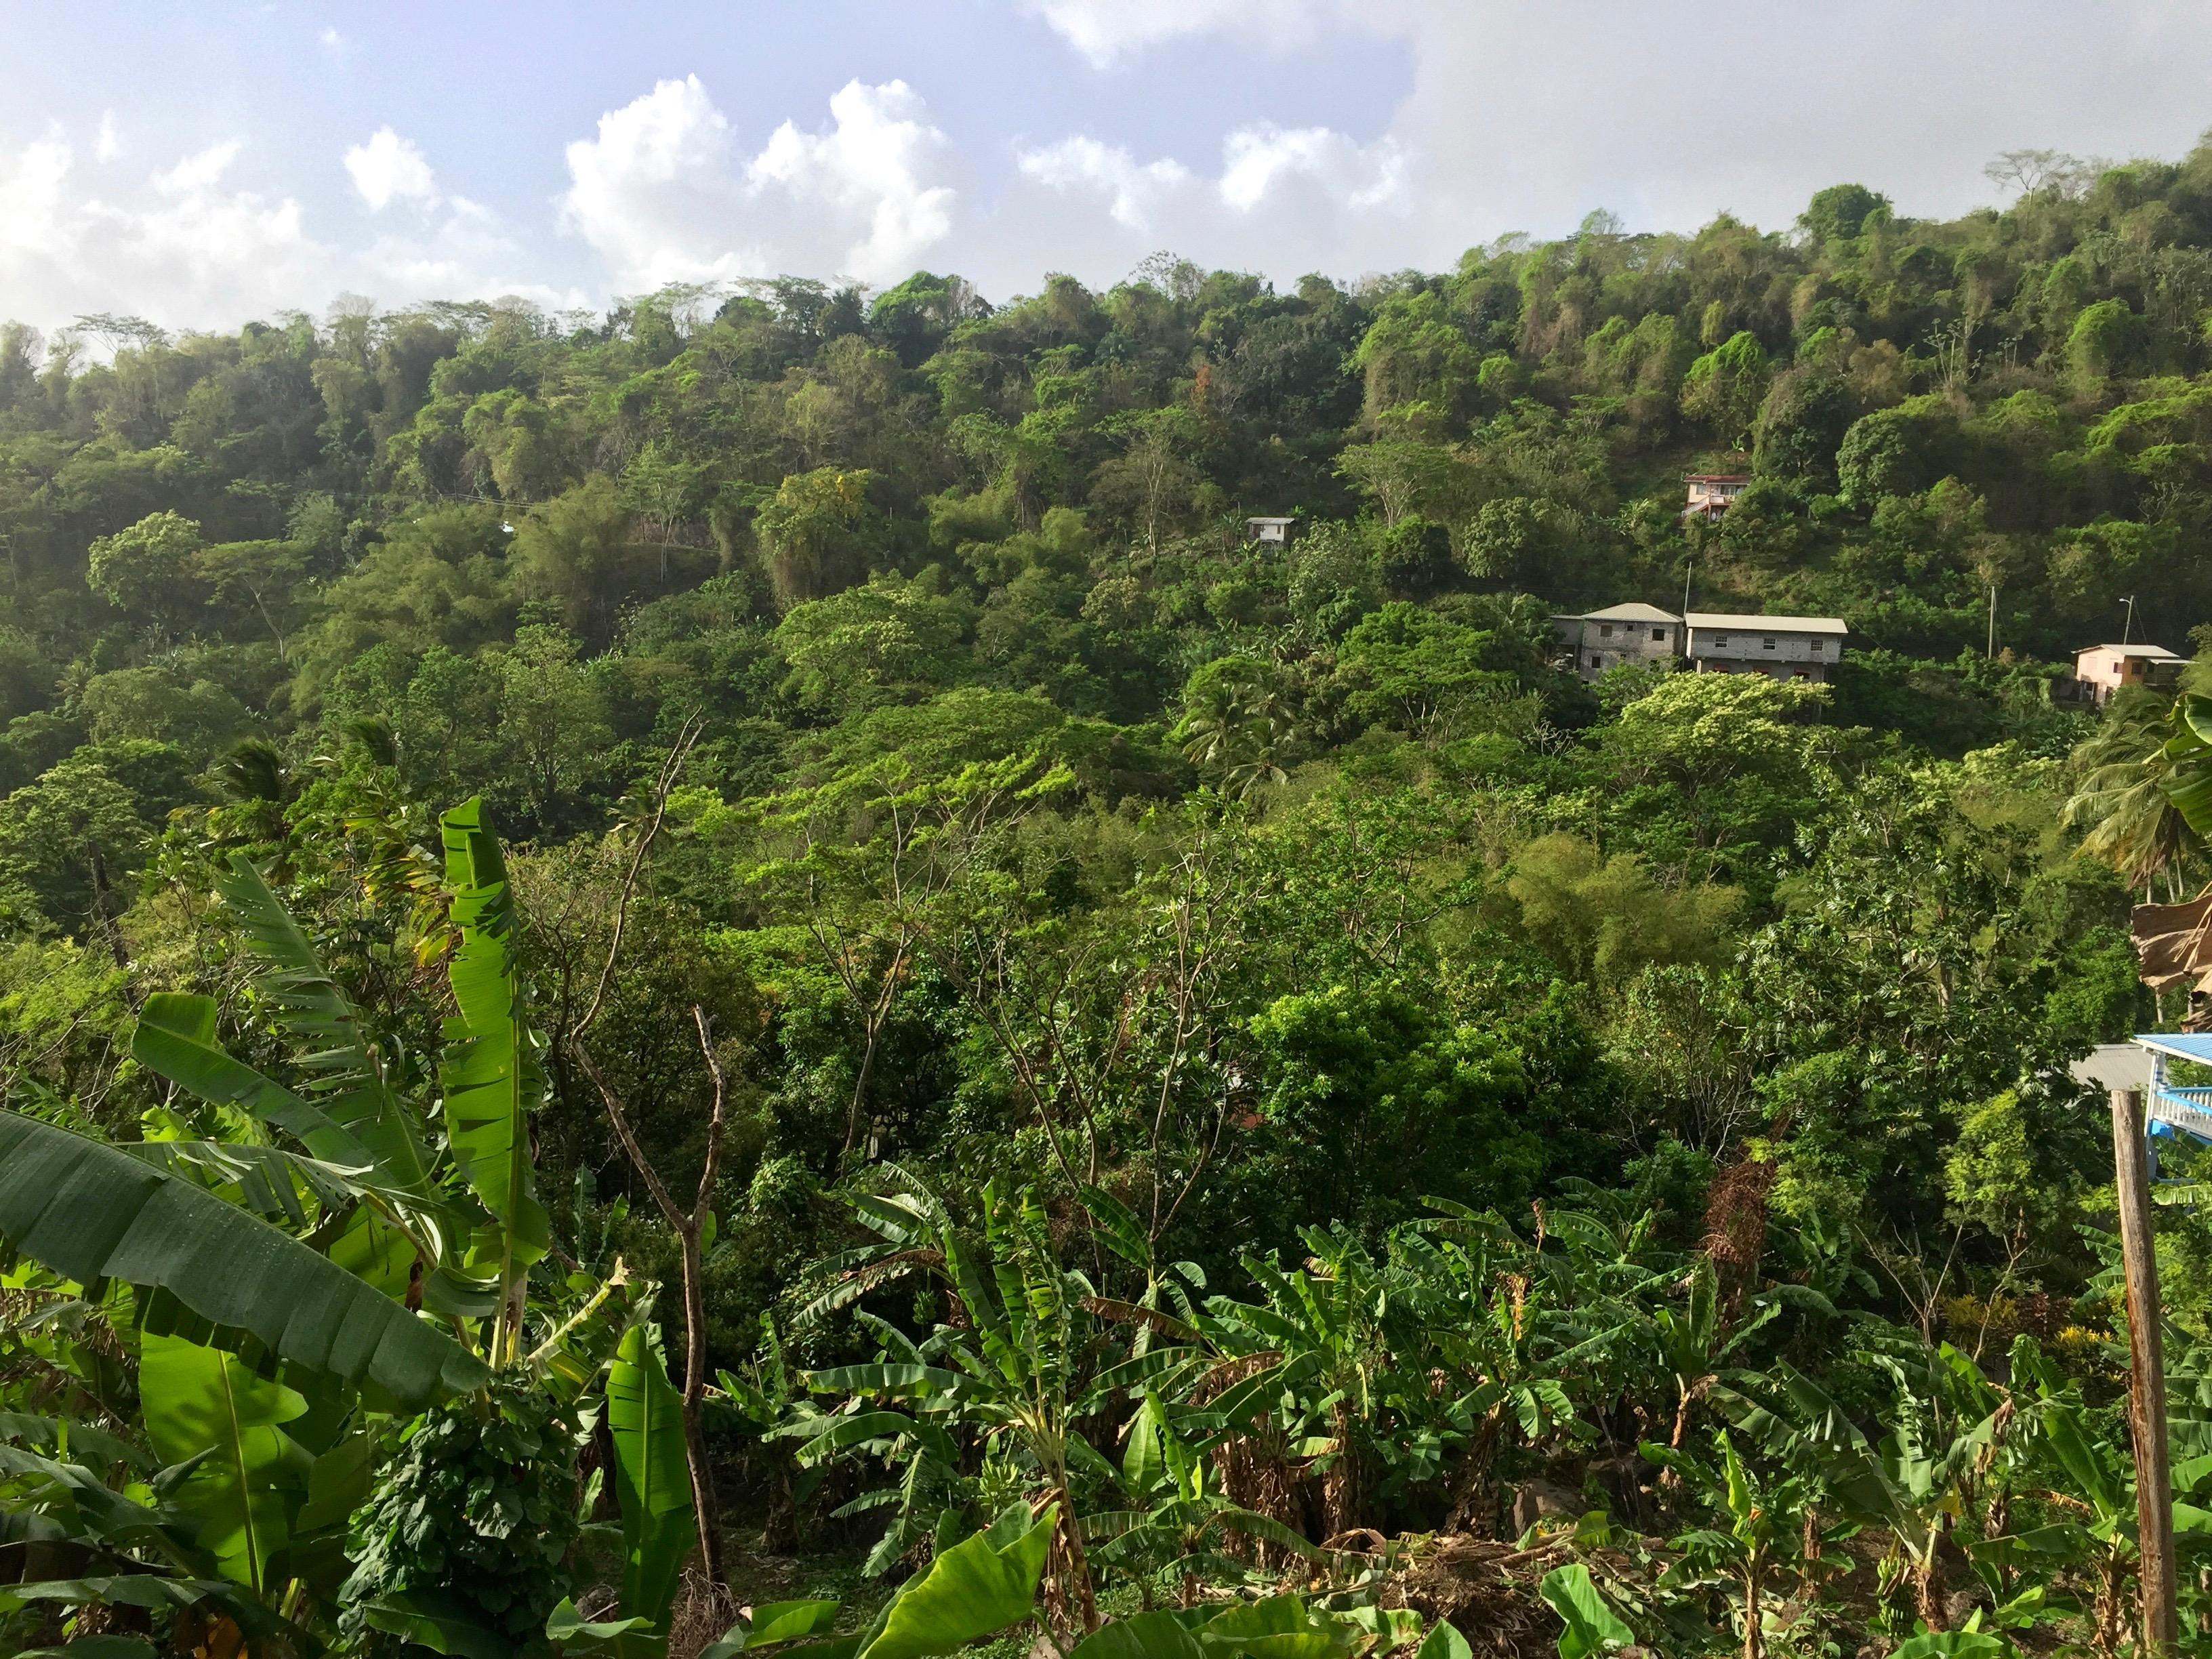 lopsakad vihmametsad